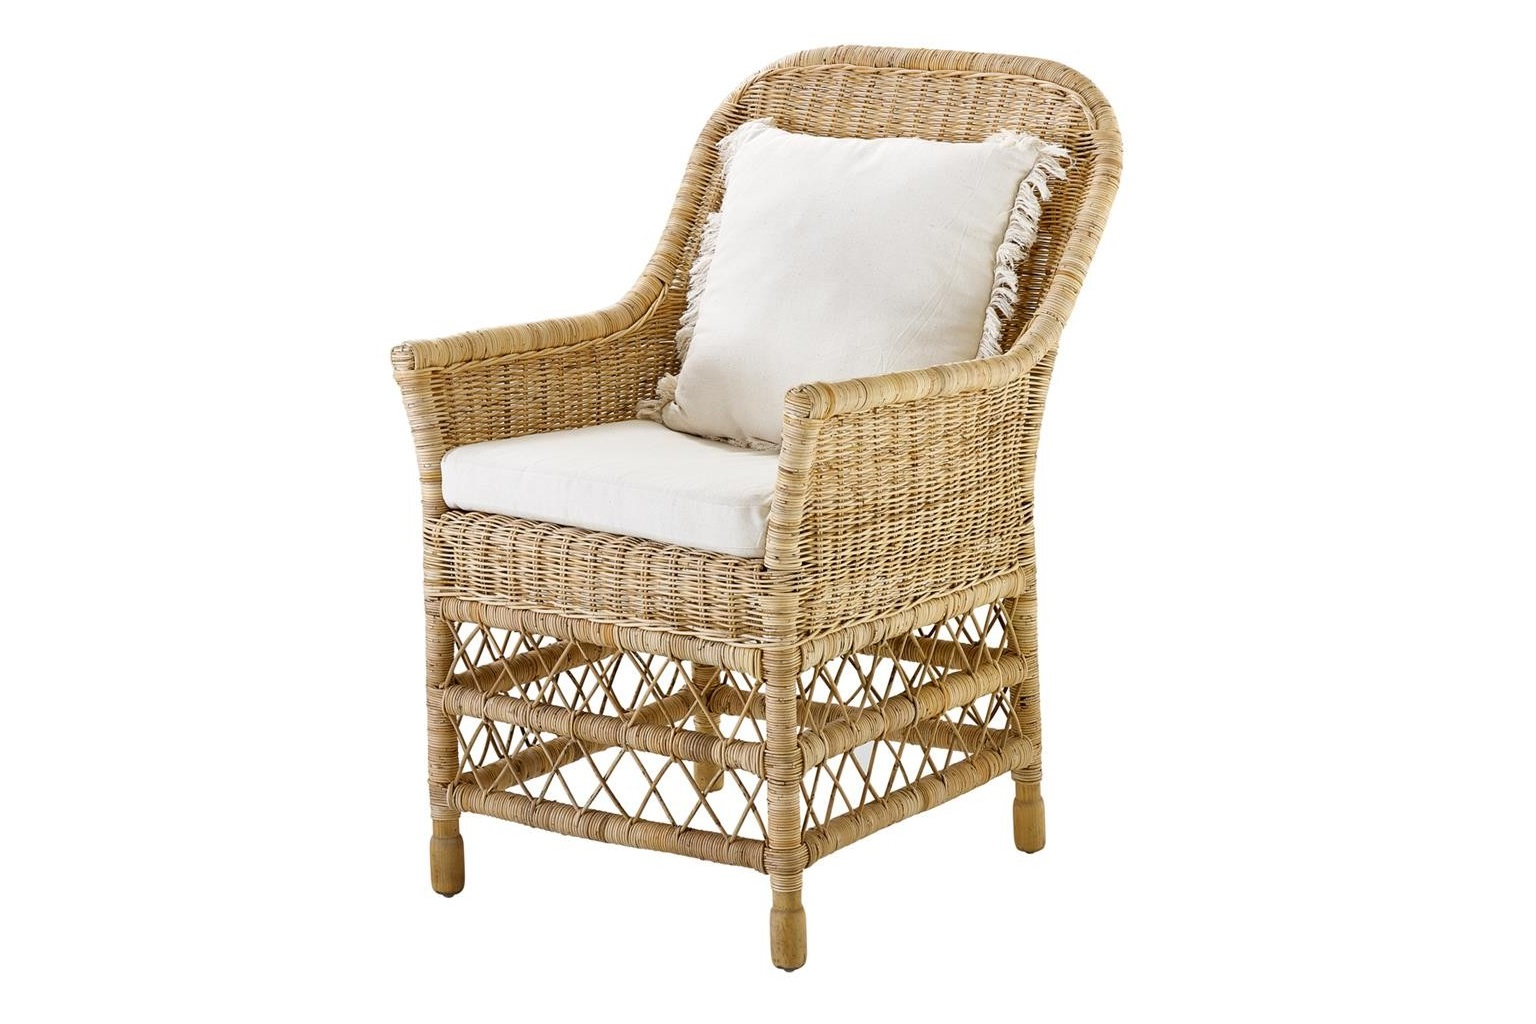 Кресло ElegantКресла для сада<br><br><br>Material: Ротанг<br>Ширина см: 52<br>Высота см: 96<br>Глубина см: 57